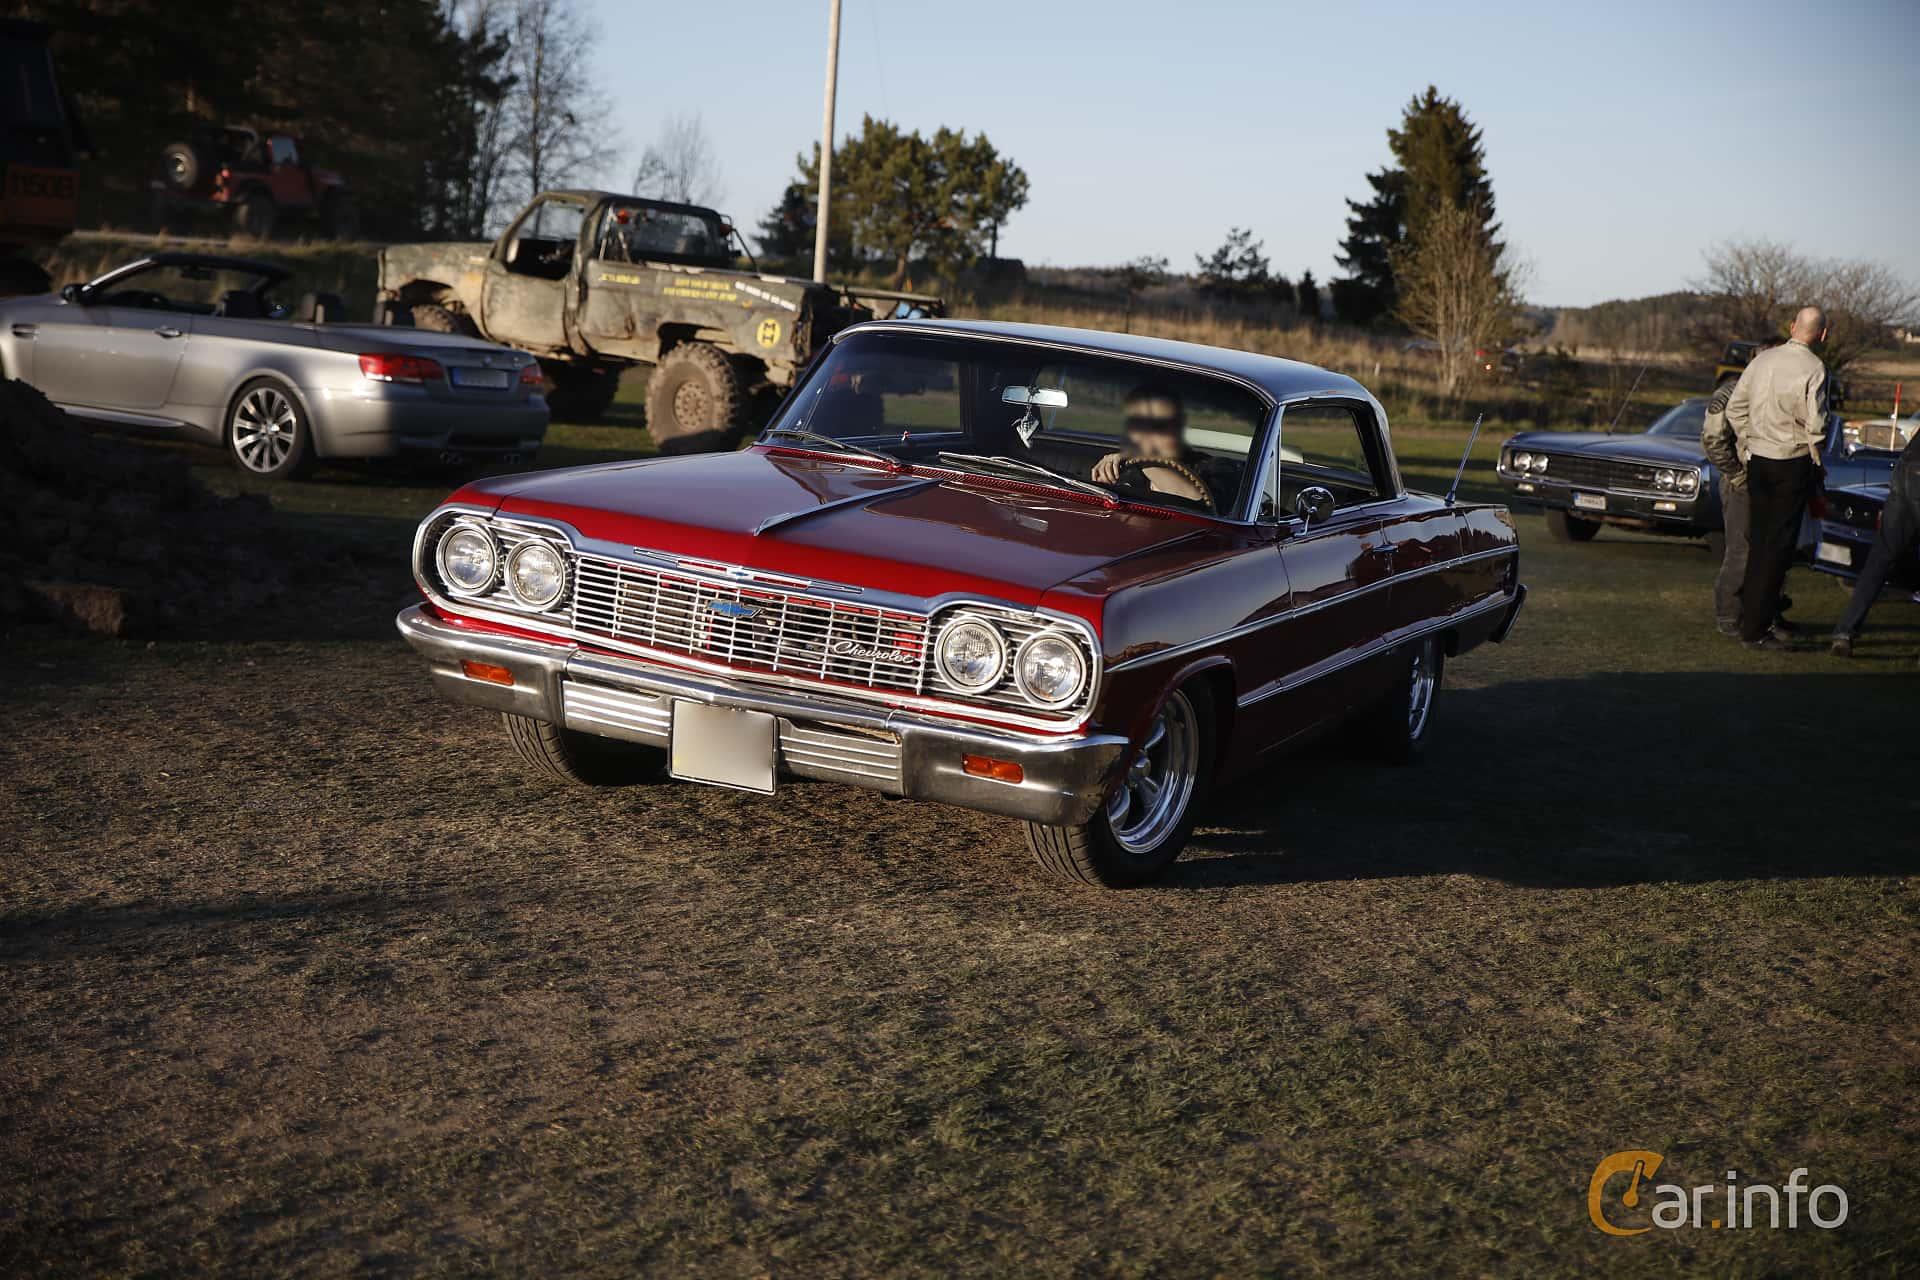 7 images of Chevrolet Impala Sport Coupé 4 6 V8 Powerglide 198hp